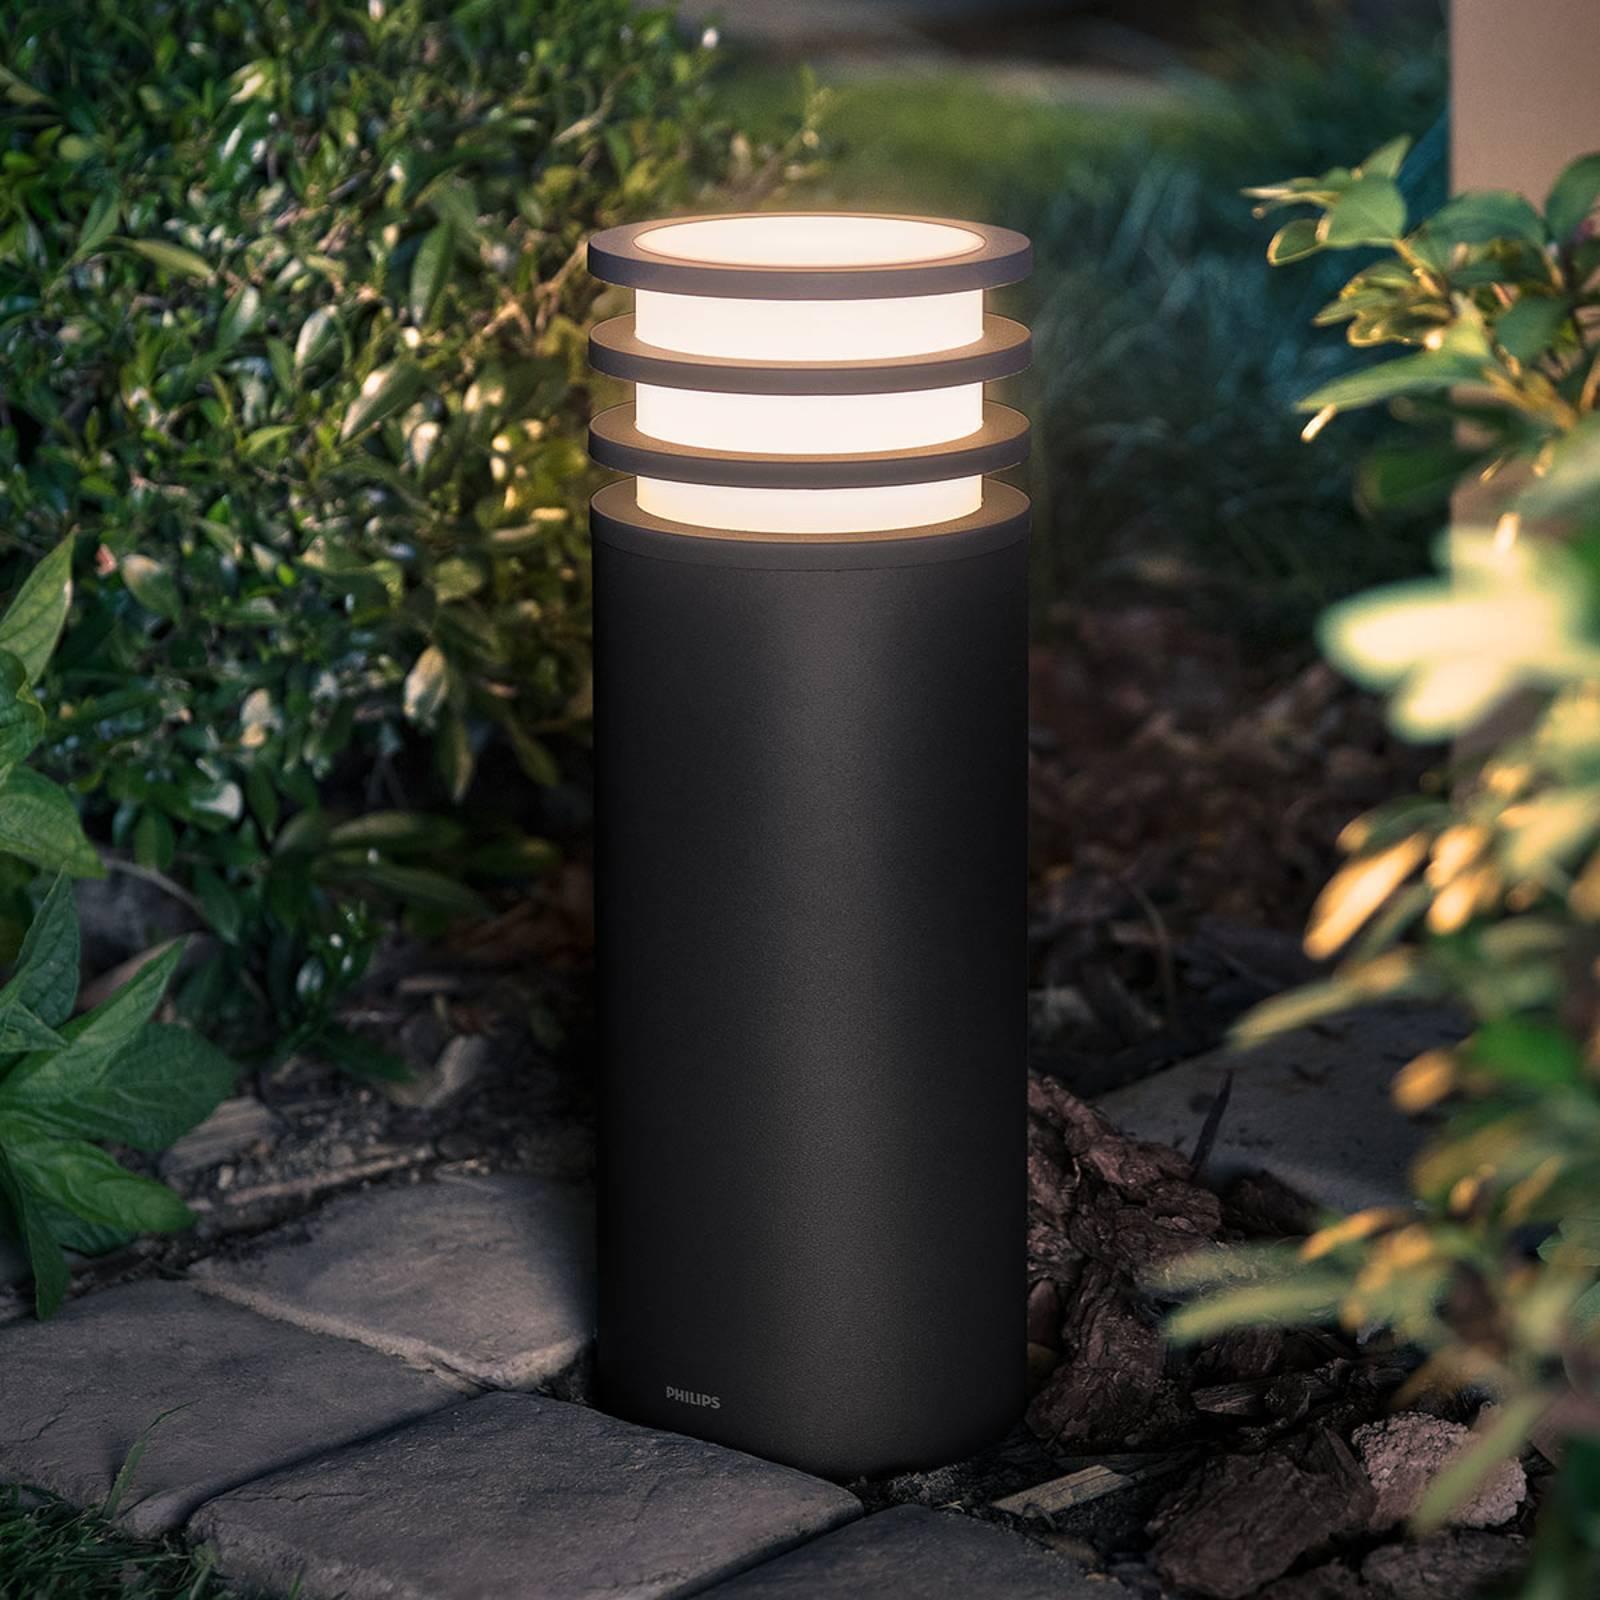 Philips Hue -LED-pollarivalaisin Lucca